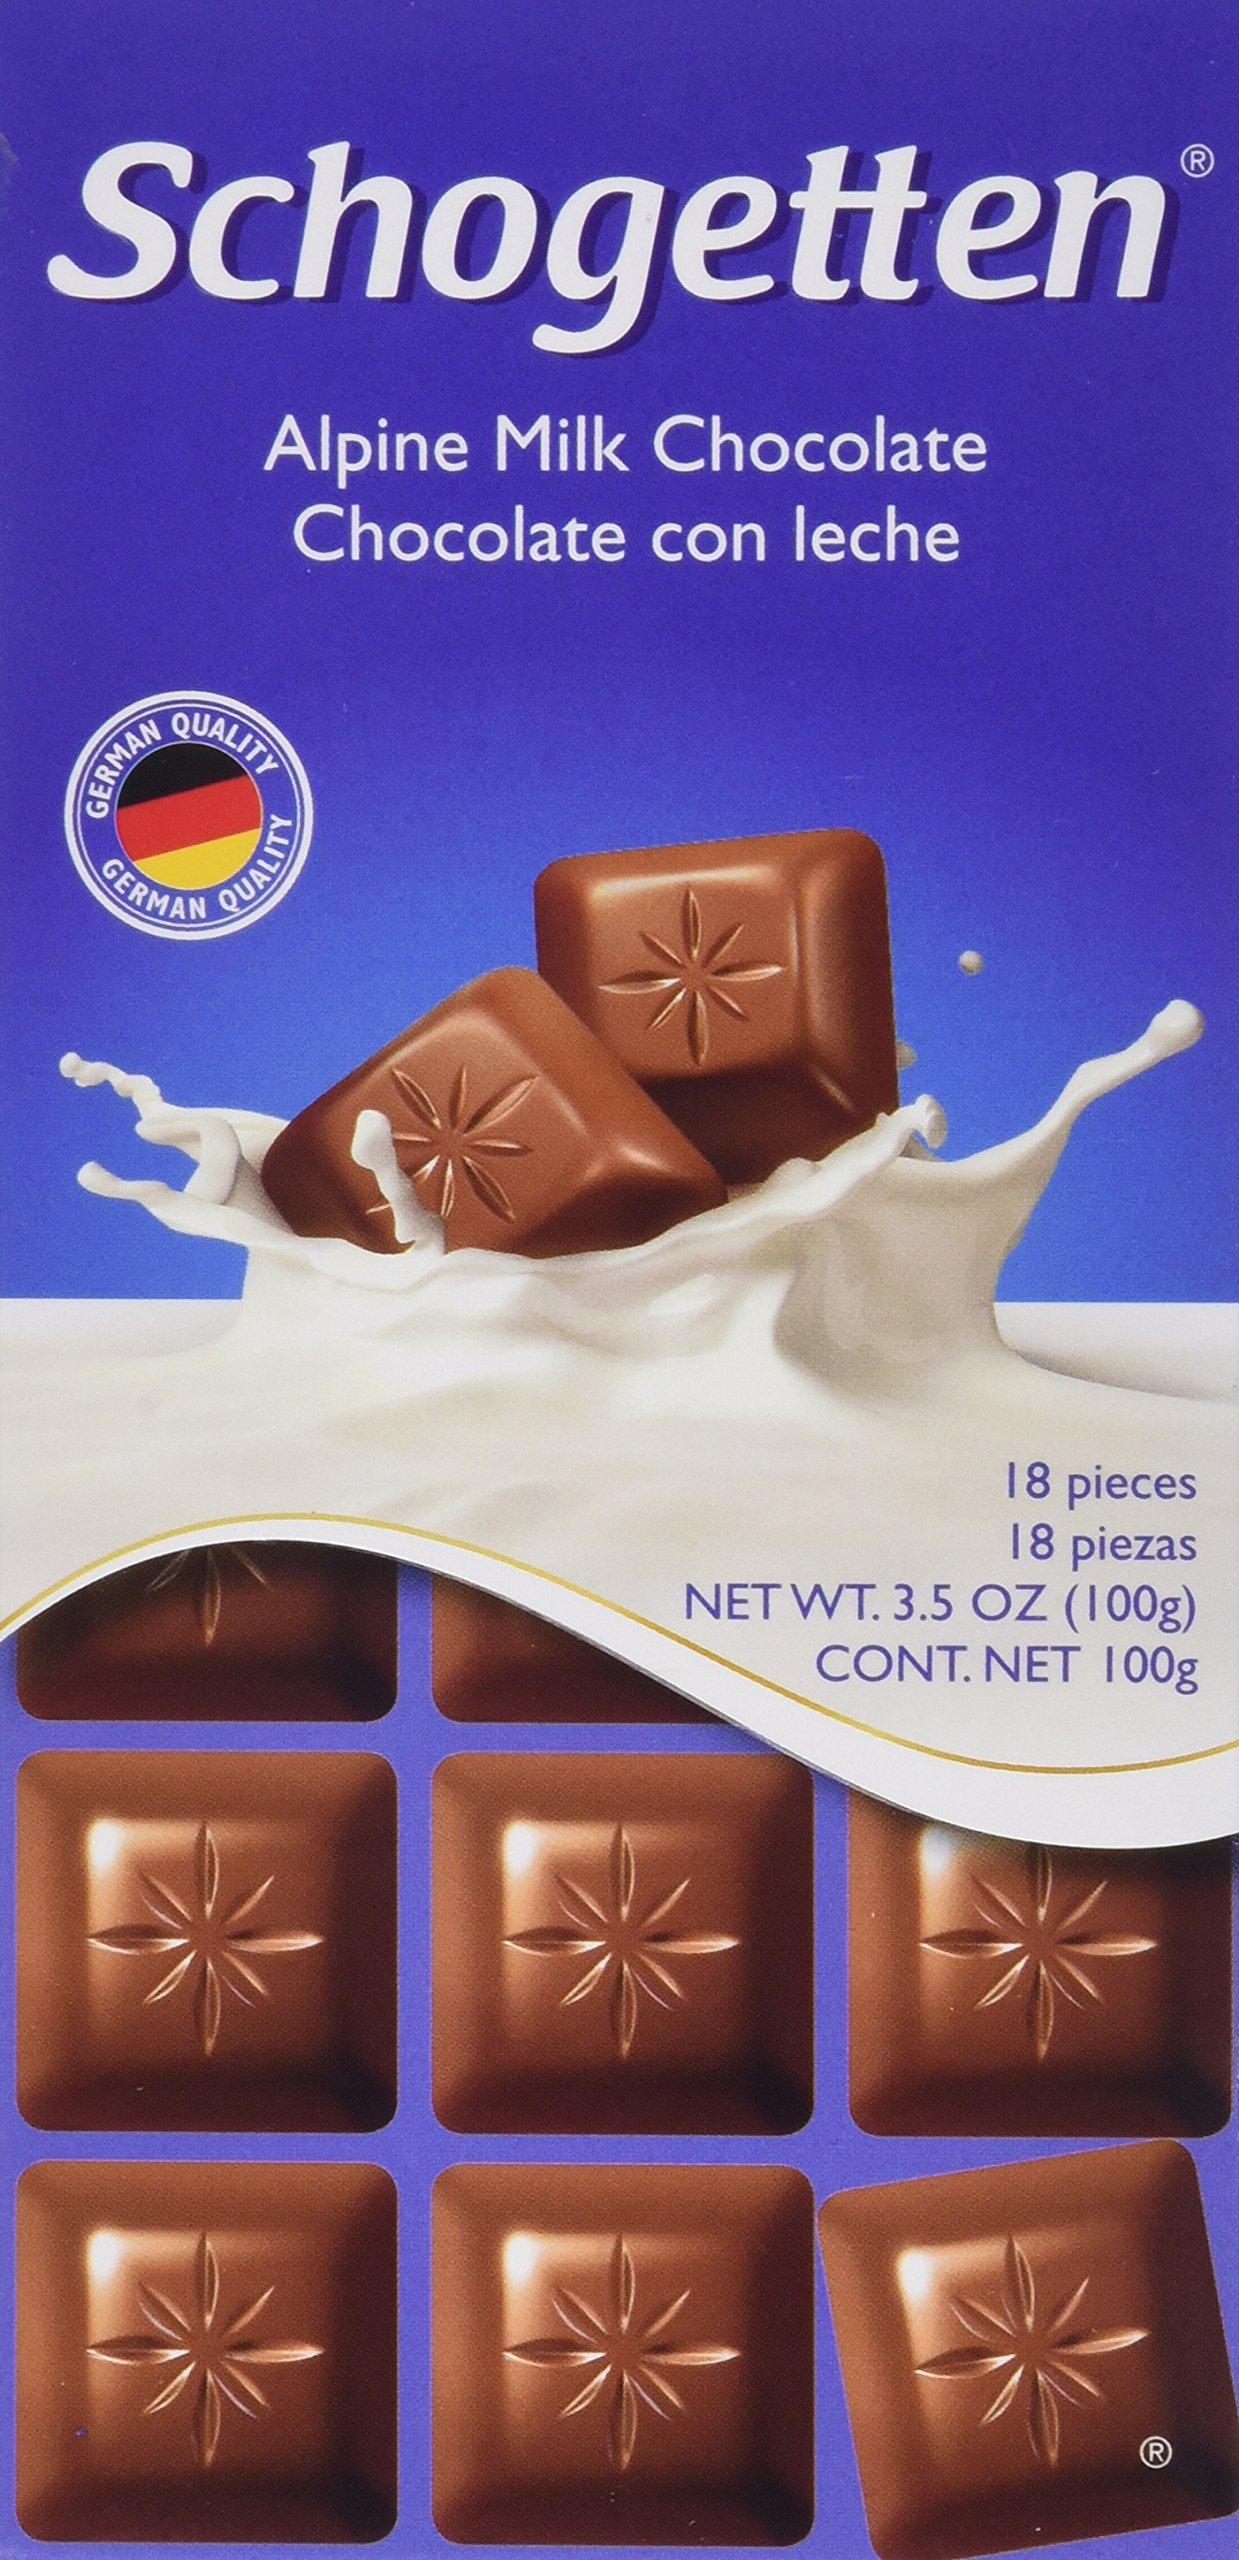 Schogetten Alpine Milk Chocolate German Chocolate Bars (Pack of 3)